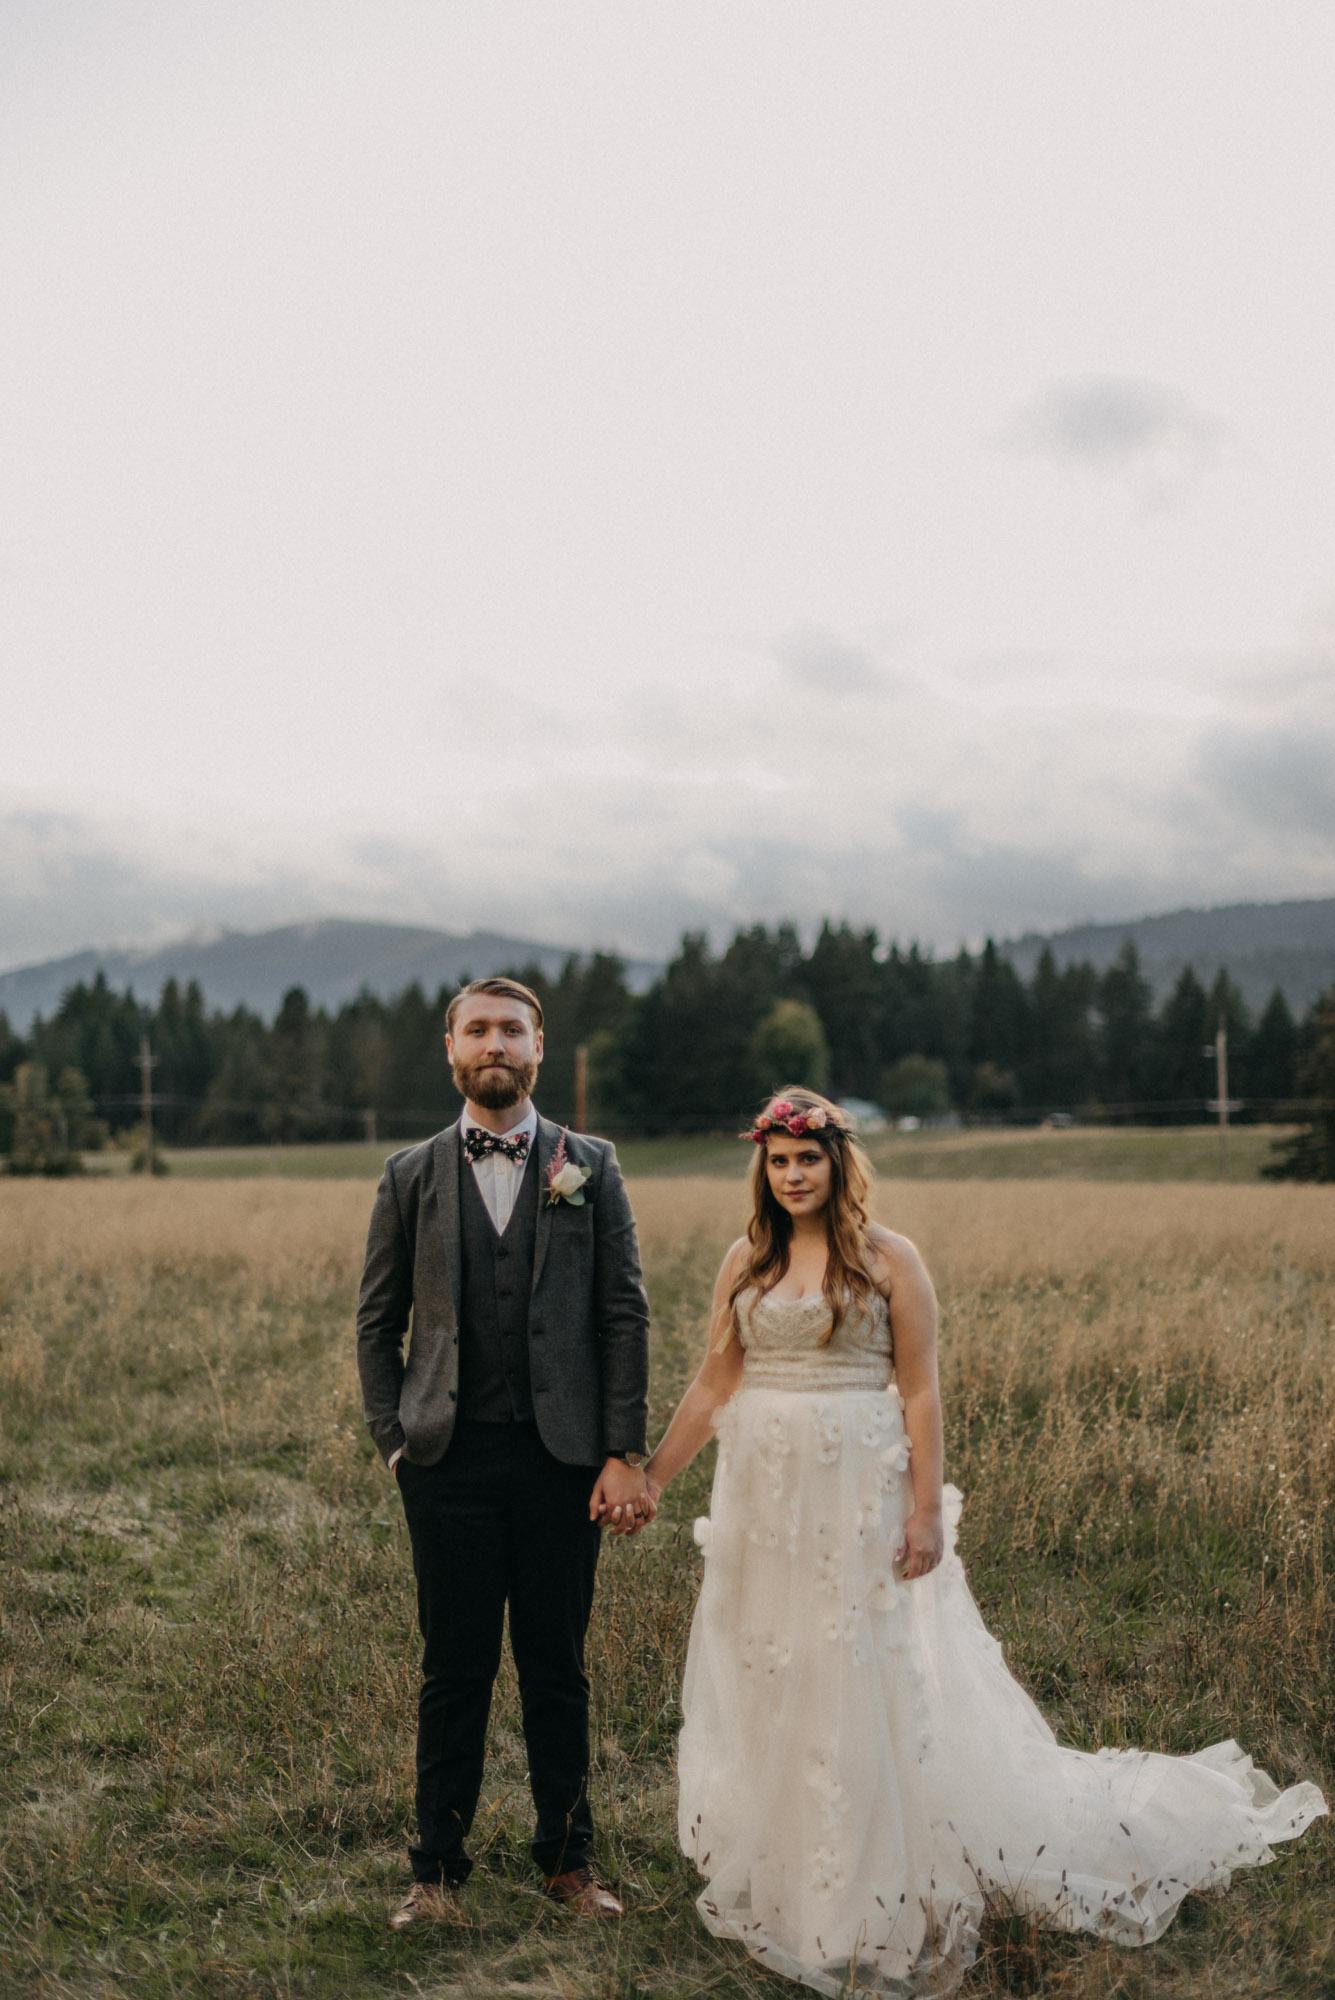 Portland-Washington-Wedding-Photographer-Outdoor-9574.jpg